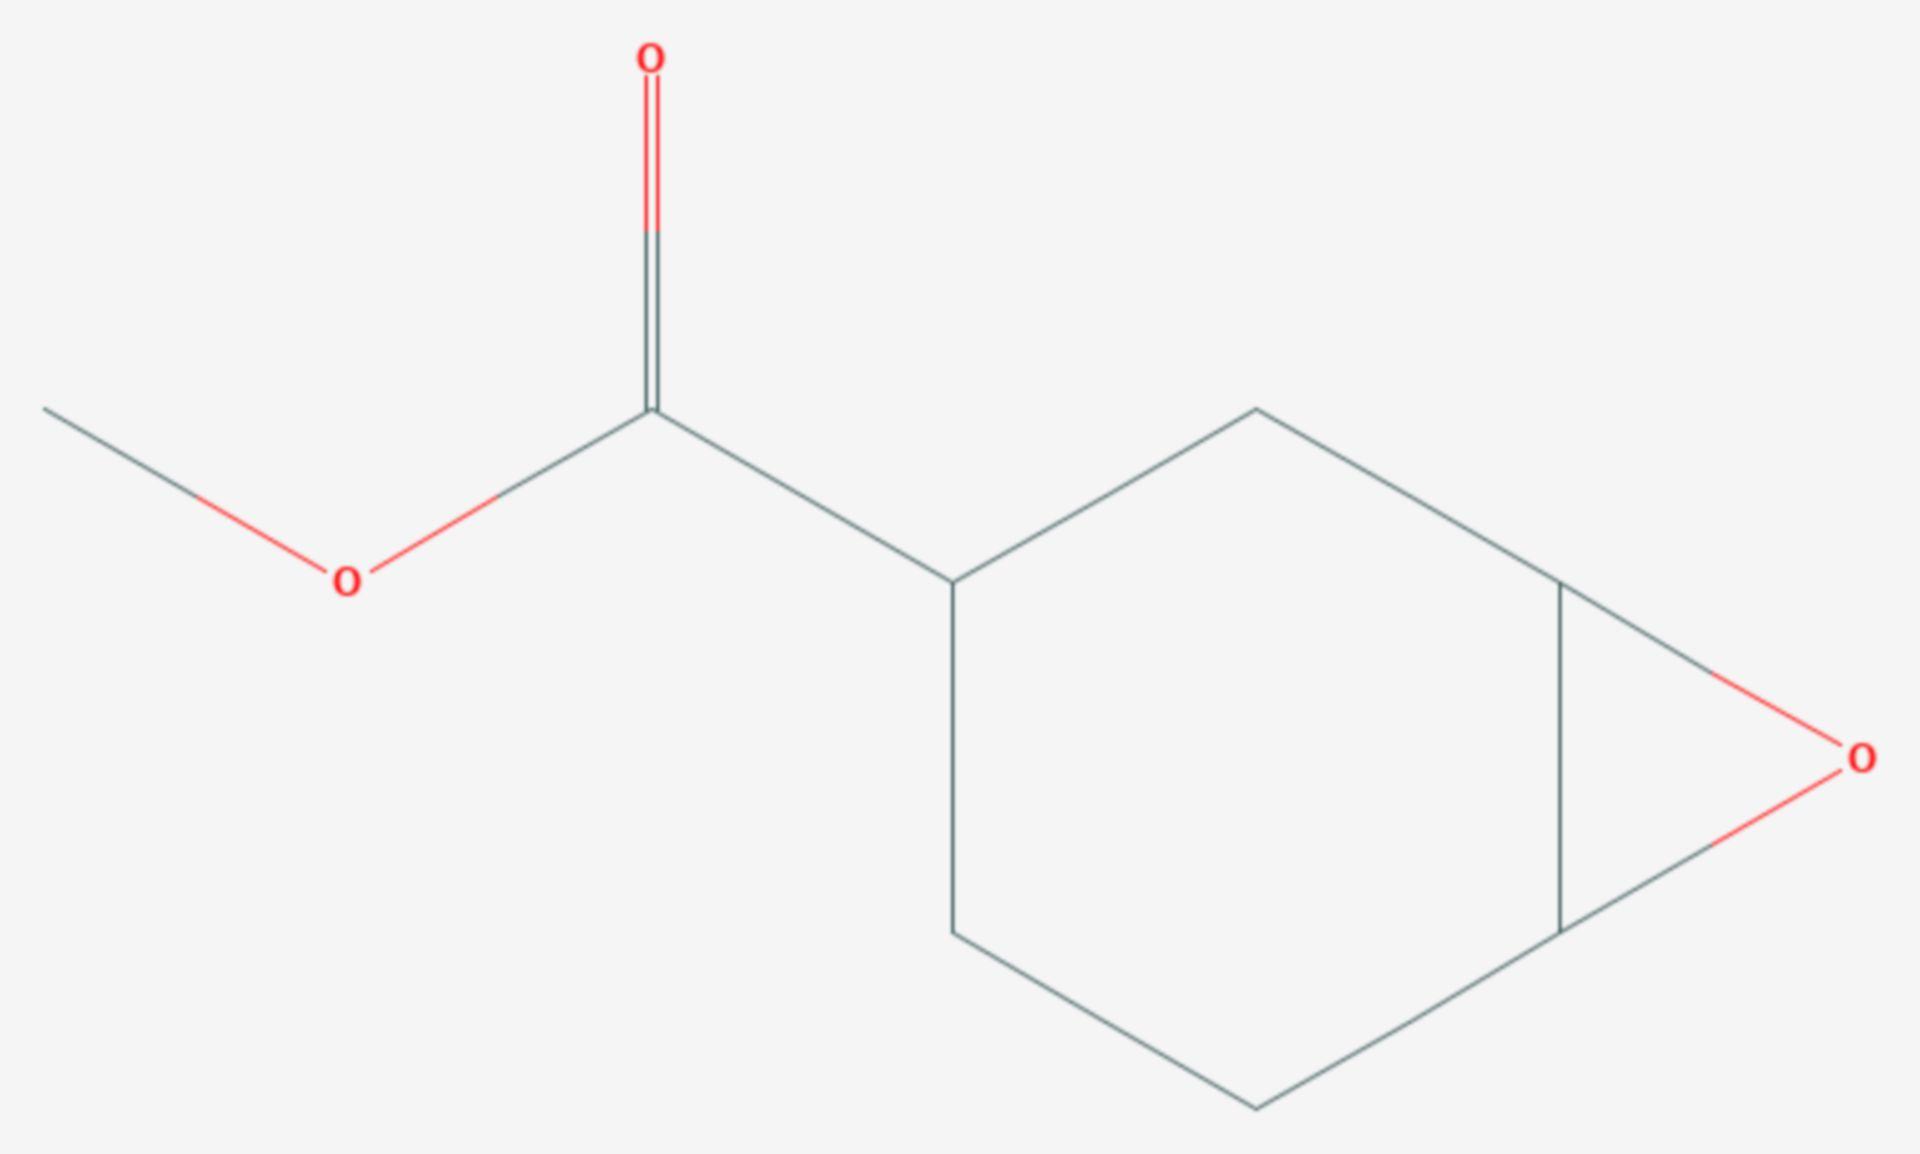 3,4-Epoxycyclohexancarboxylatmethylester (Strukturformel)